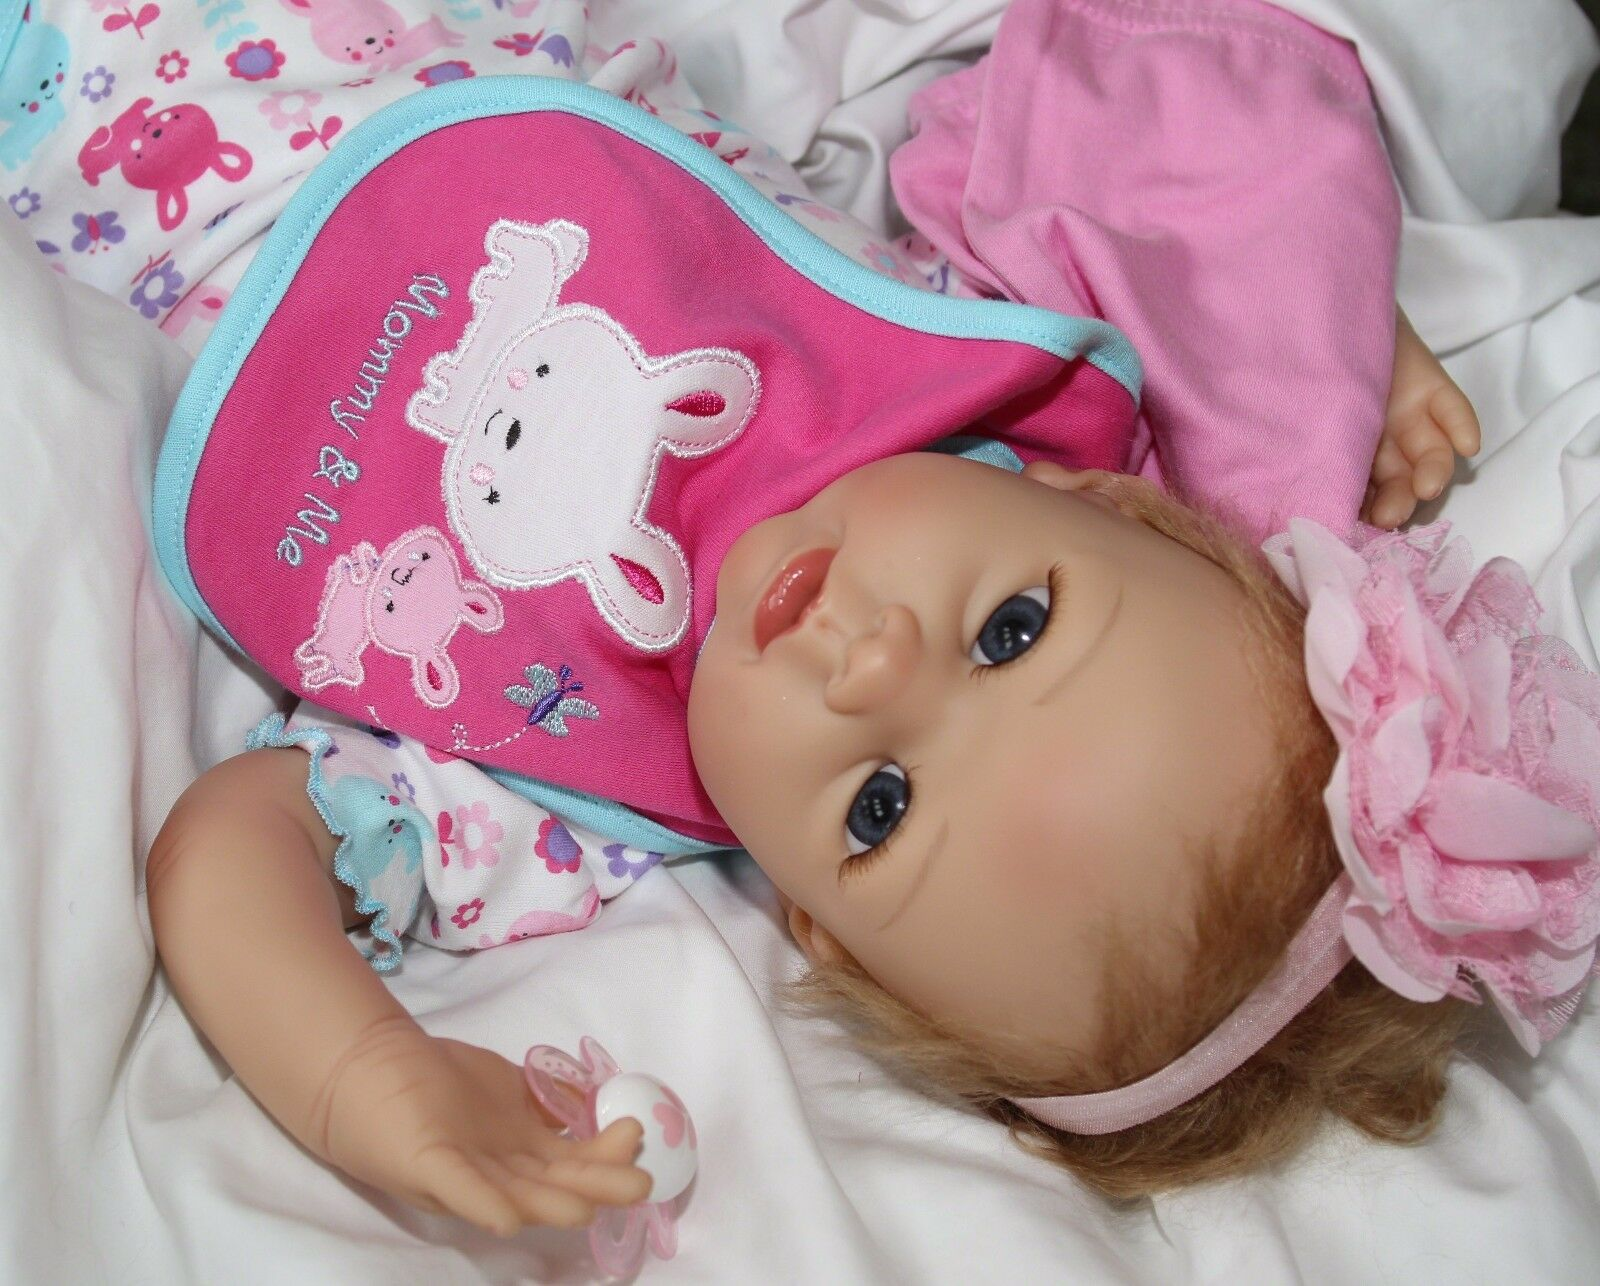 Mamá me ama  realista mueve 22 pulgadas Muñeca Bebé Niña Chupete + 2 conjuntos